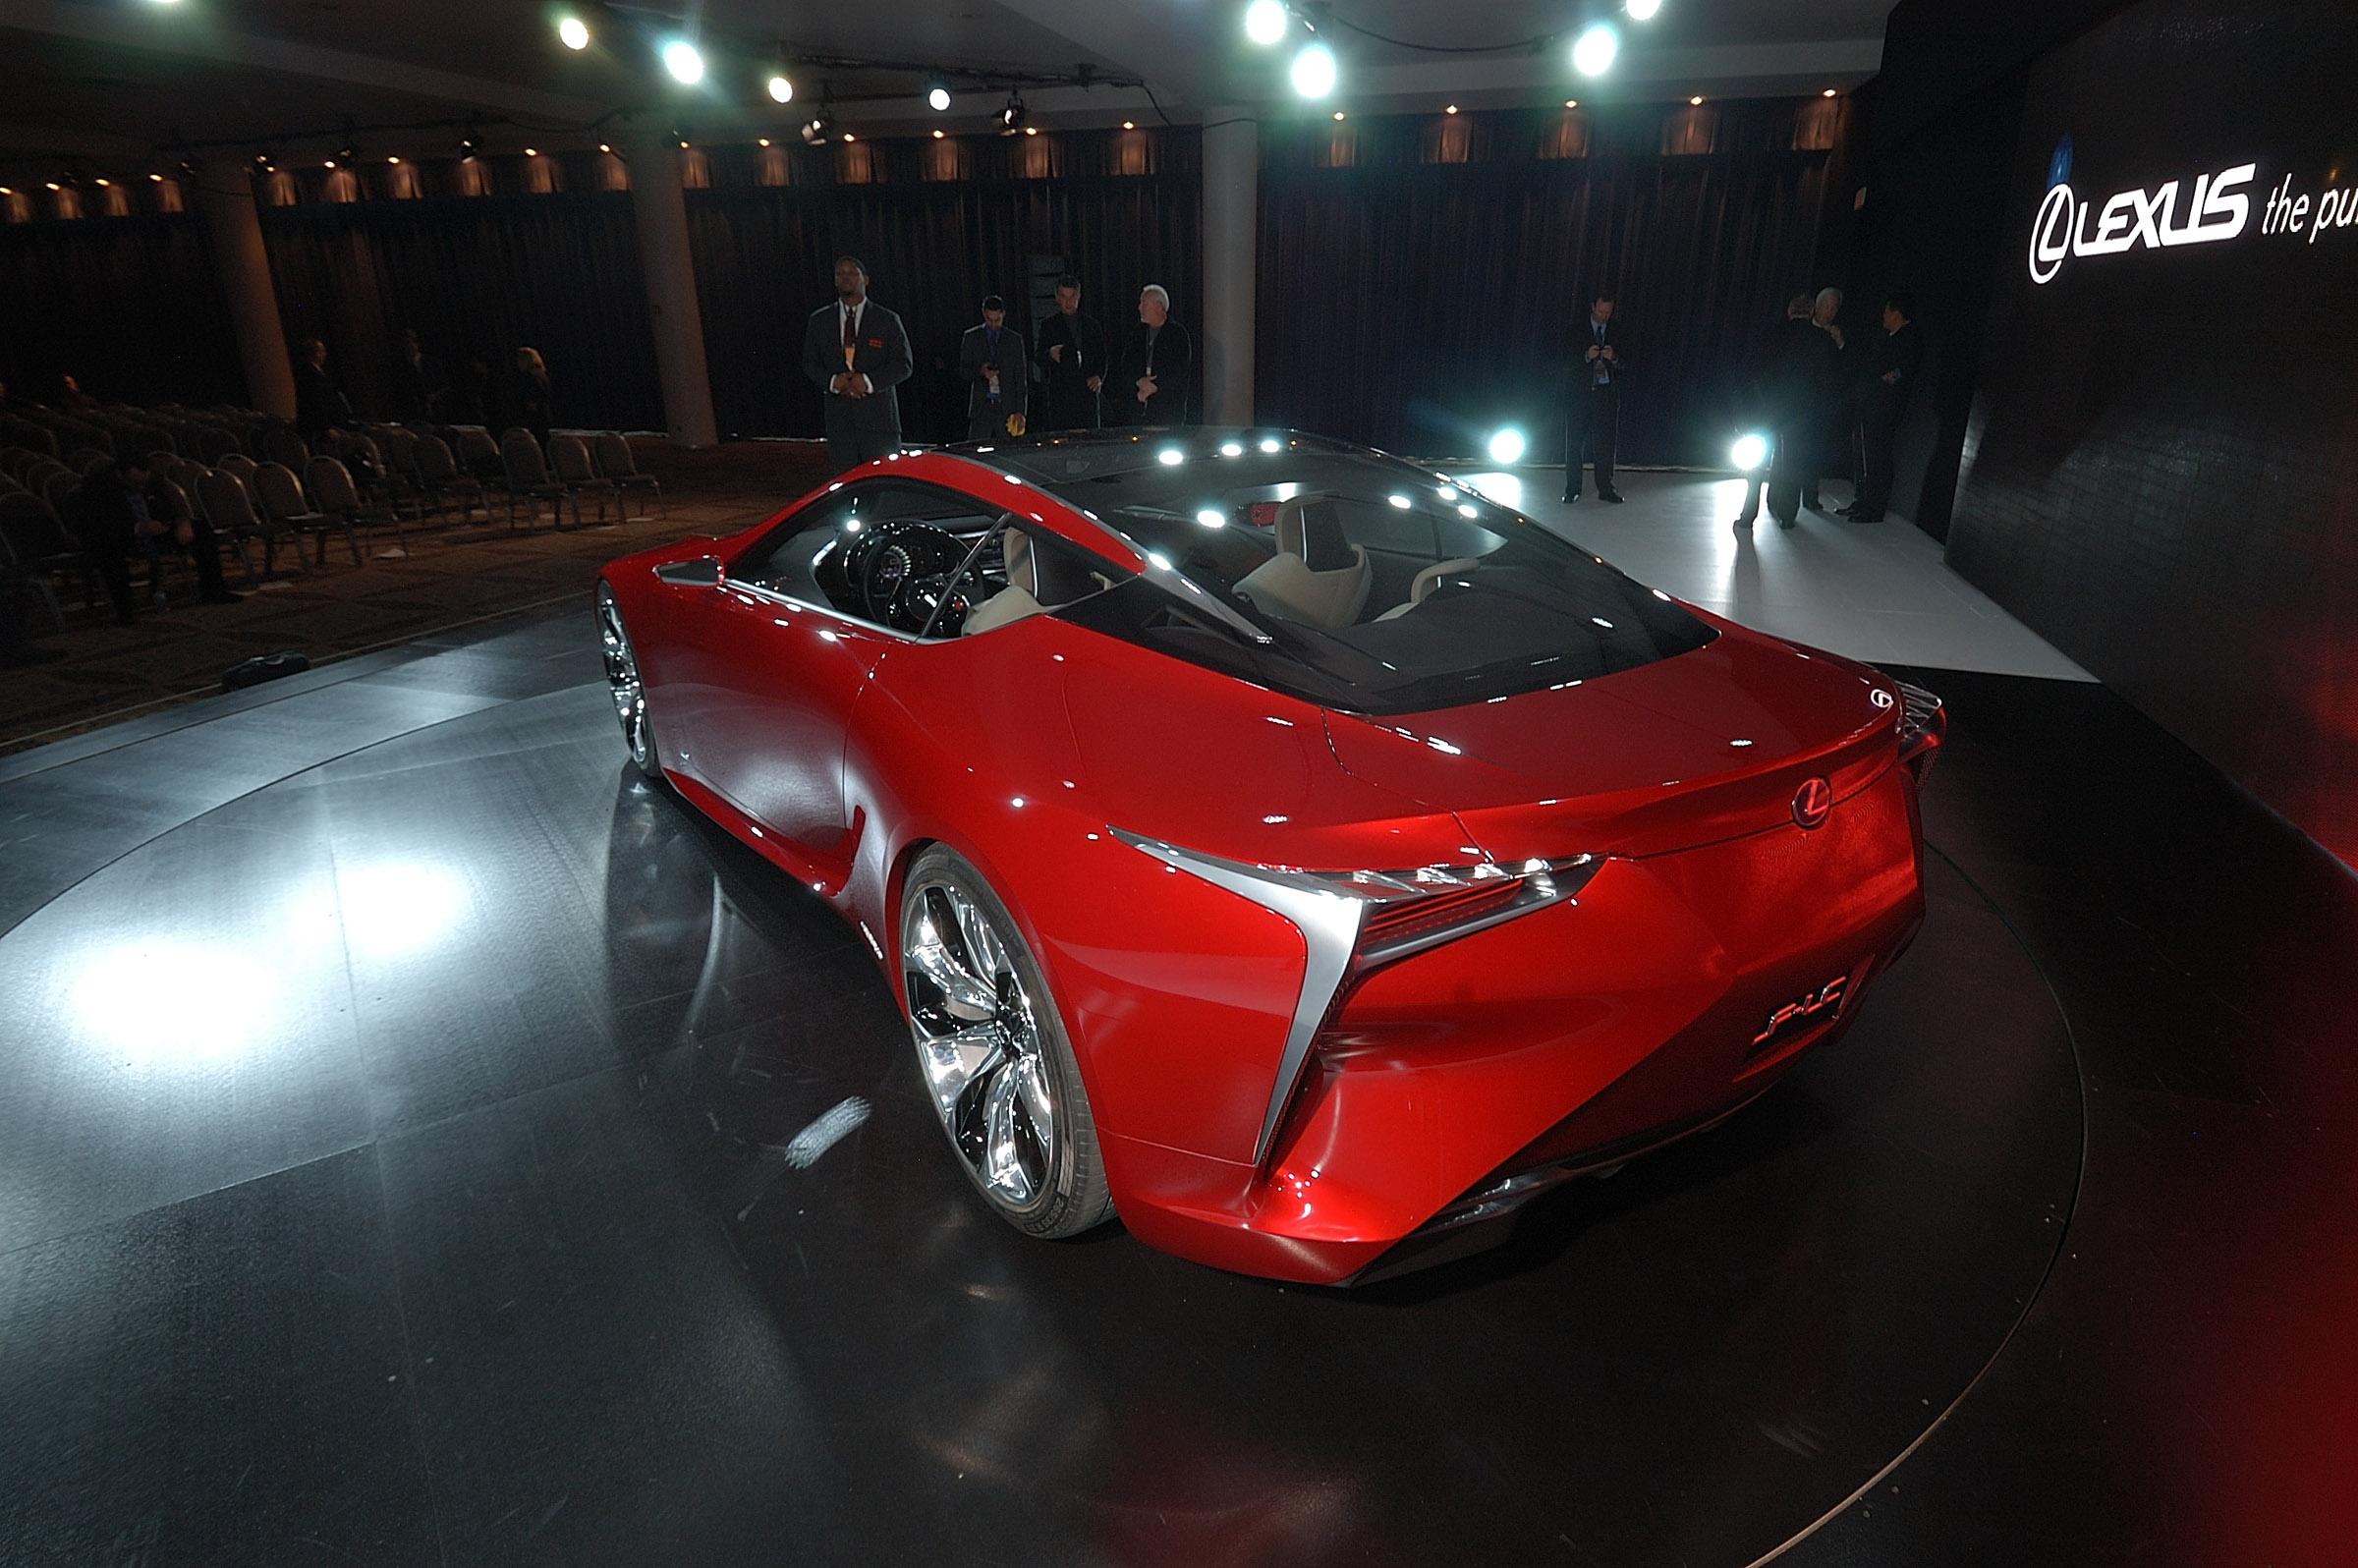 http://www.automobilesreview.com/img/2012-lexus-lf-lc-concept-detroit-2012/2012-lexus-lf-lc-concept-detroit-2012-04.jpg